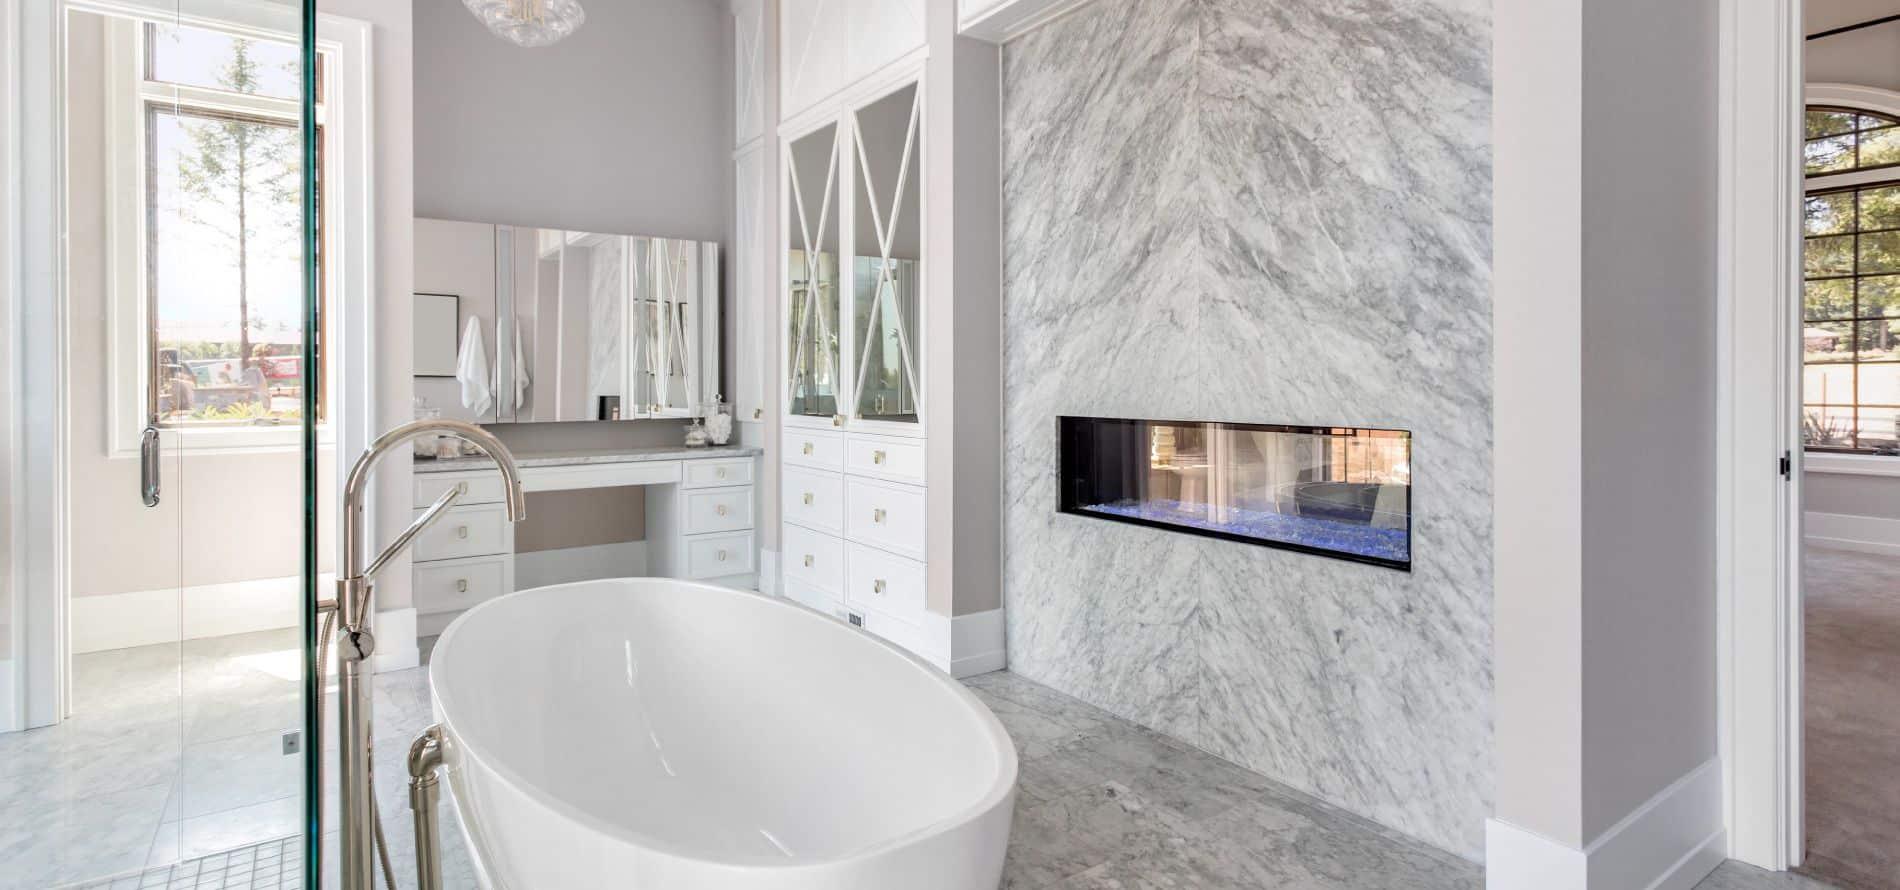 Bathroom-Renovation-in-Toronto